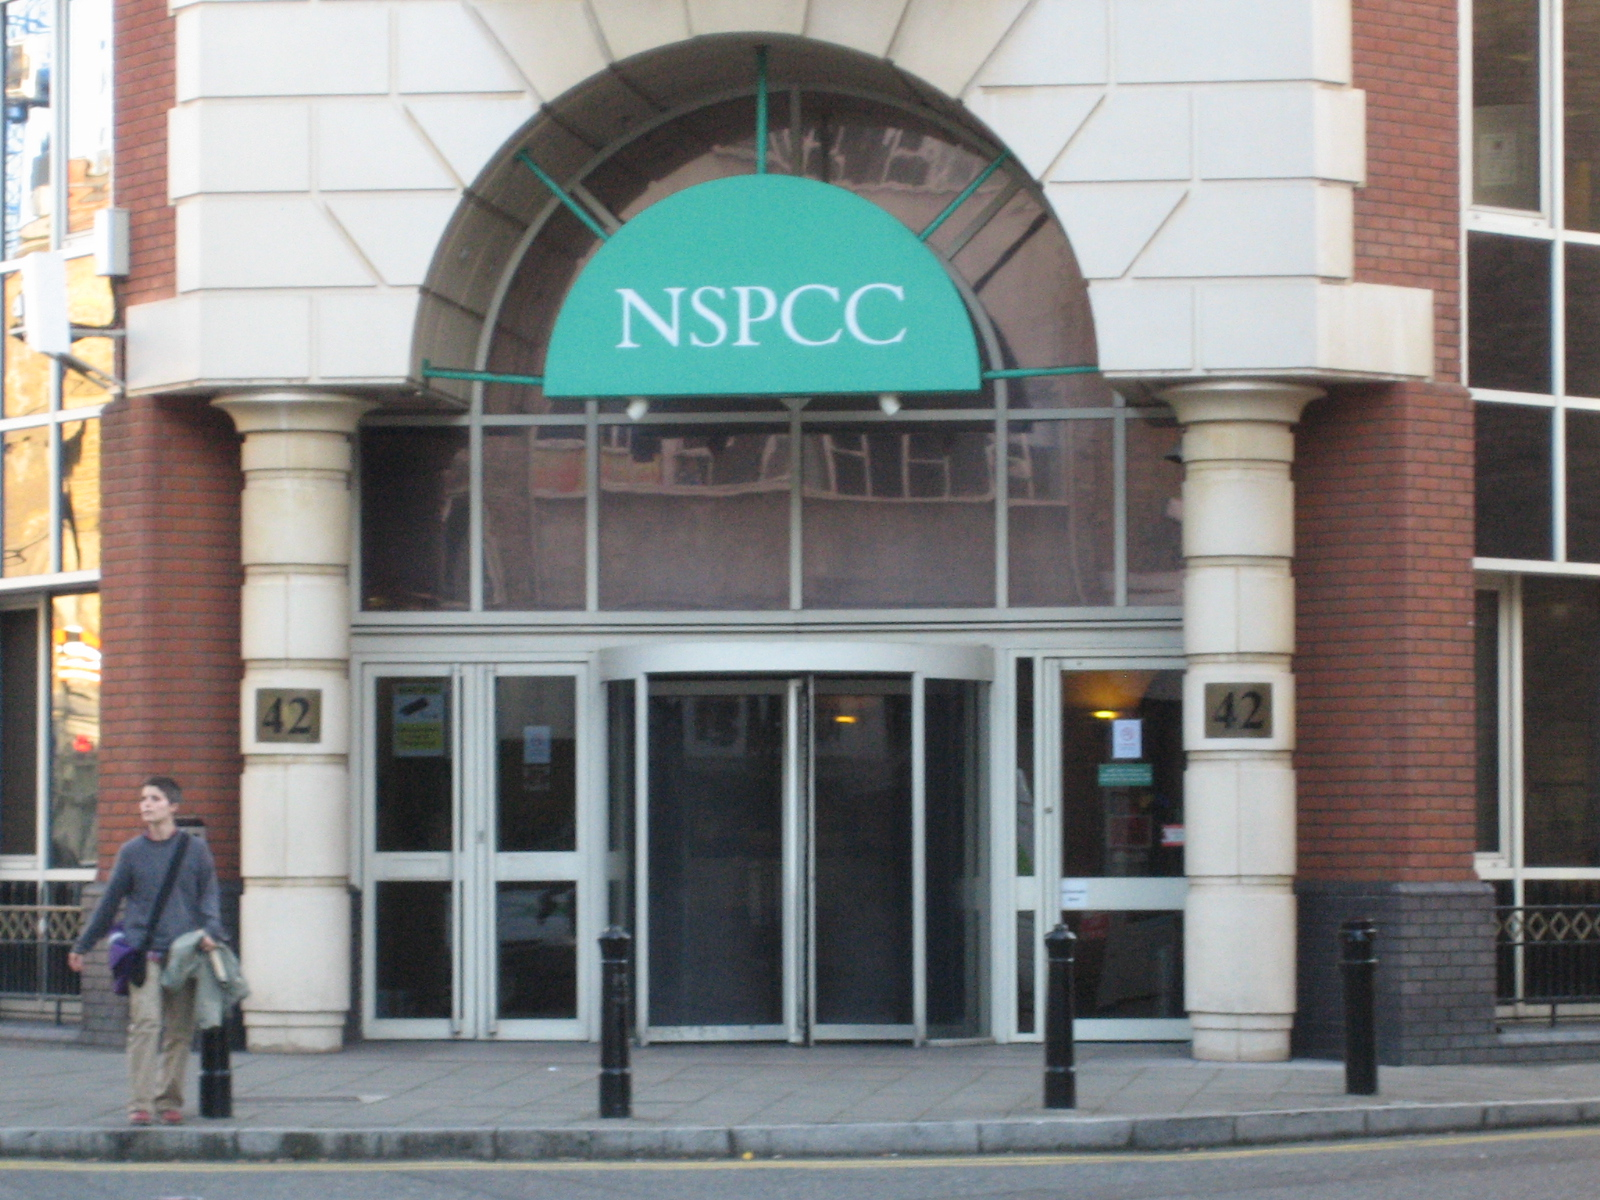 NSPCC headquarters in London Source: Wikimedia